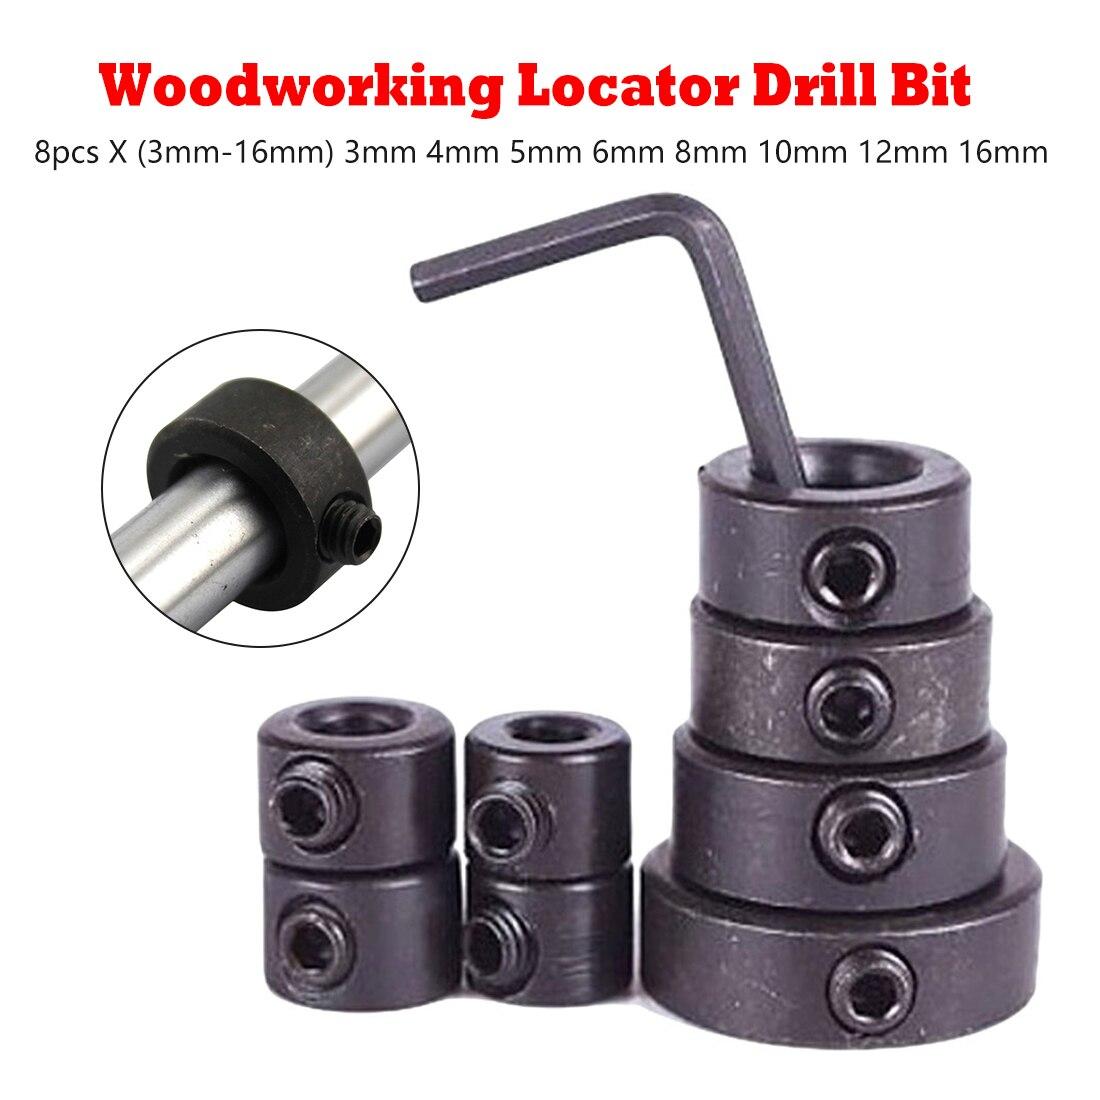 8pcs 3-16mm Woodworking Drill Locator Drill Bit Depth Stop Collars Ring Positioner Drill Locator Wood Drill Bit